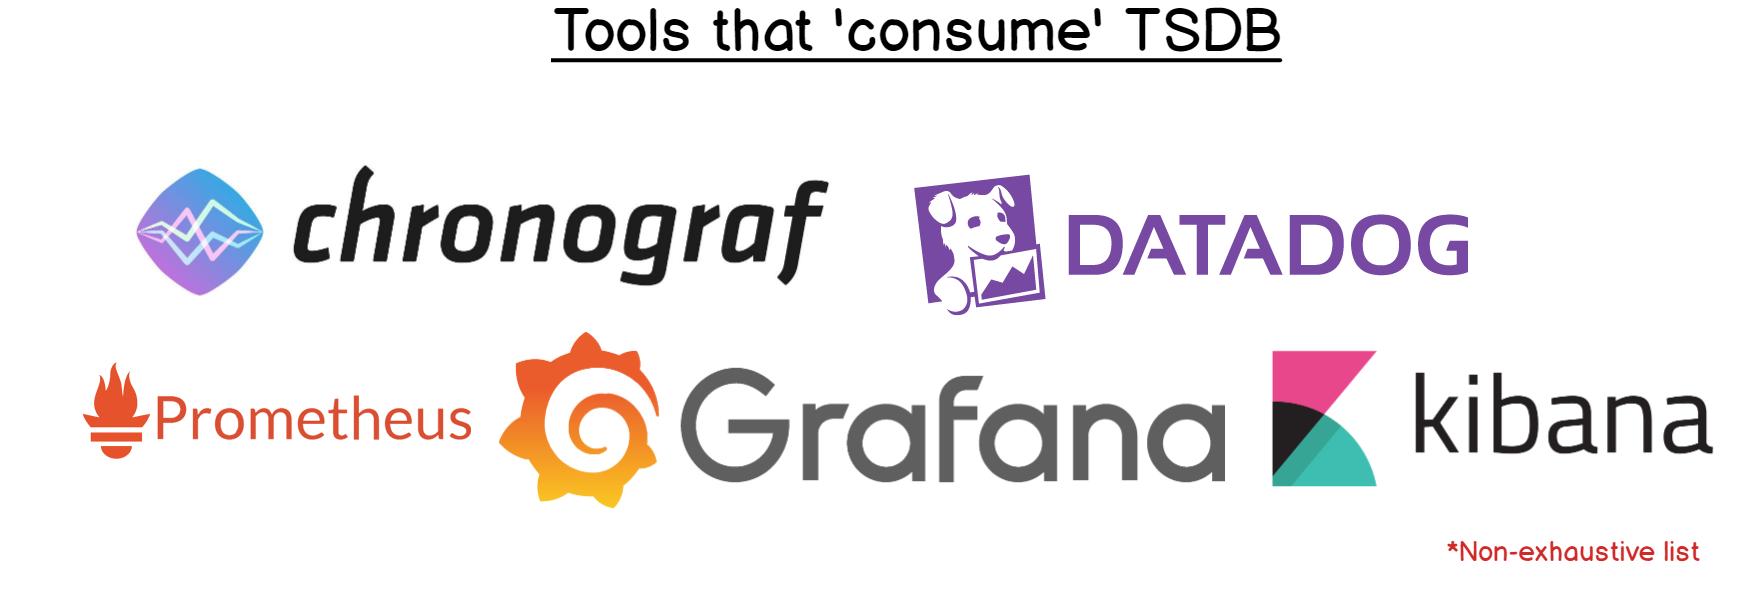 TSDB Consumers